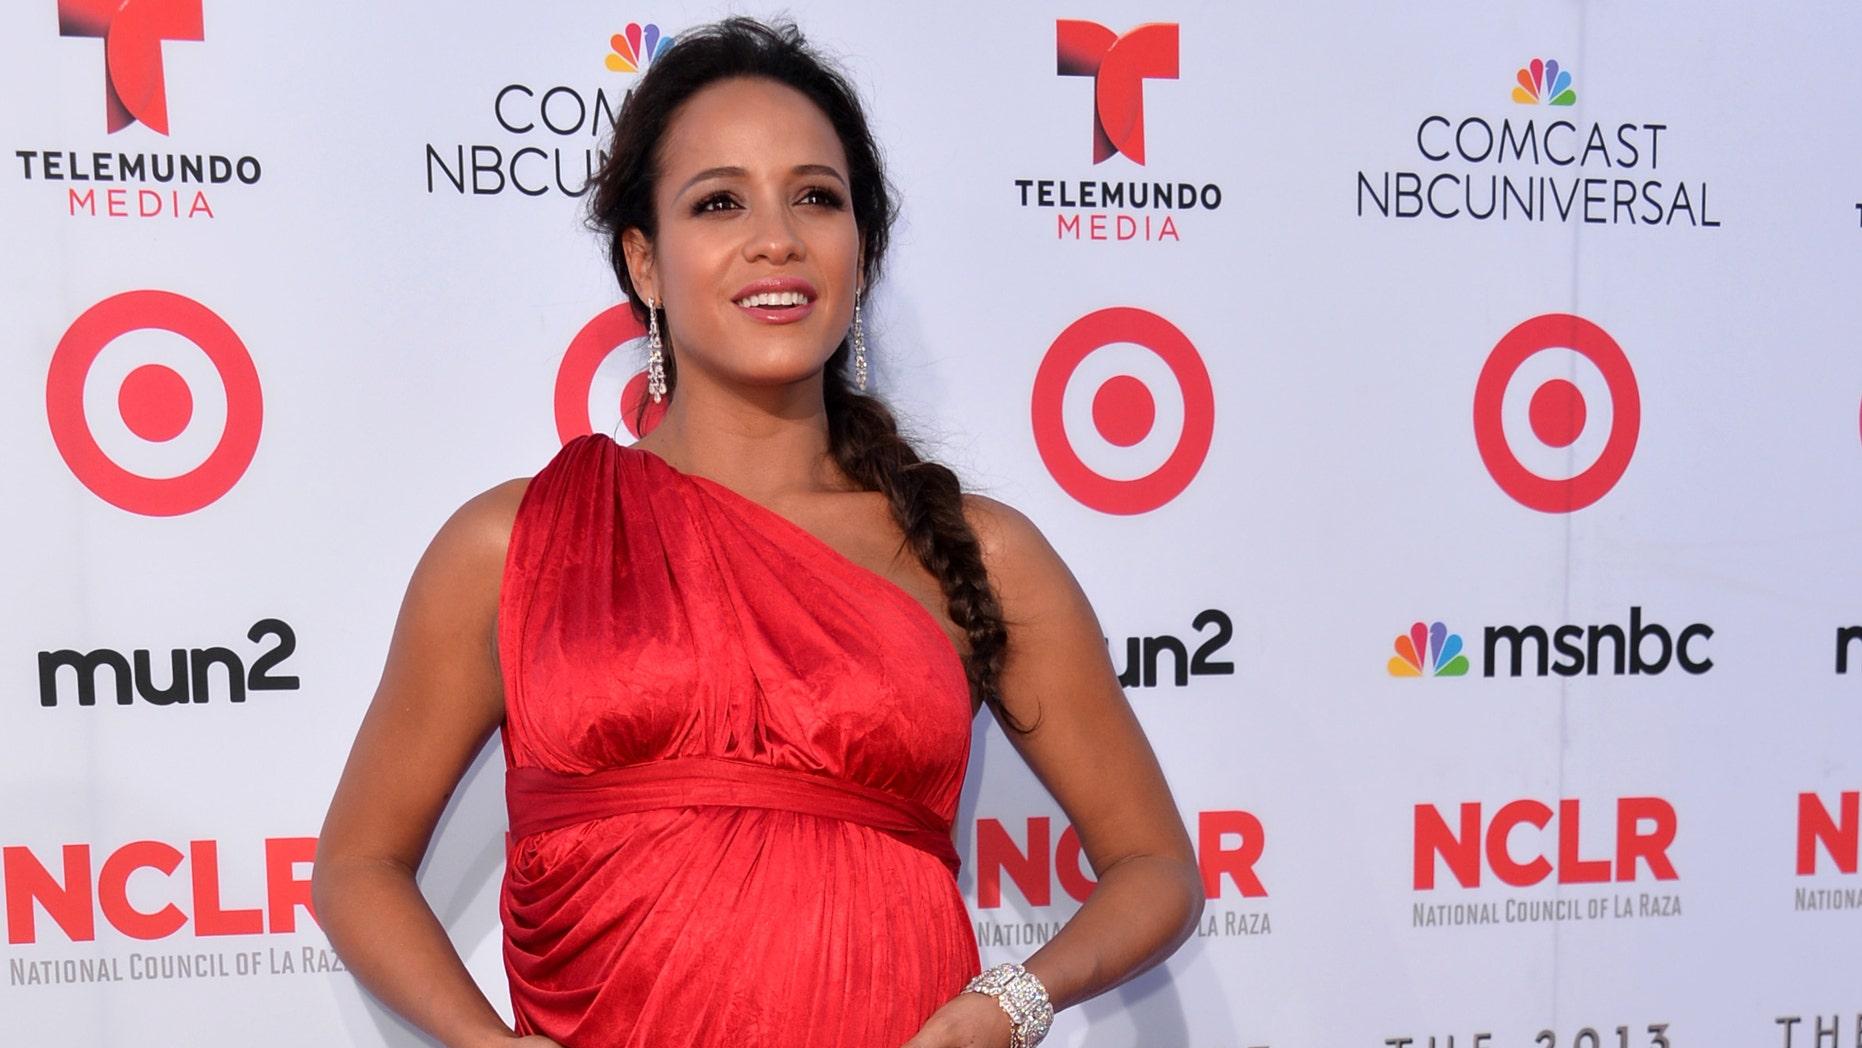 Dania Ramirez at the 2013 NCLR ALMA Awards on September 27, 2013 in Pasadena, California.